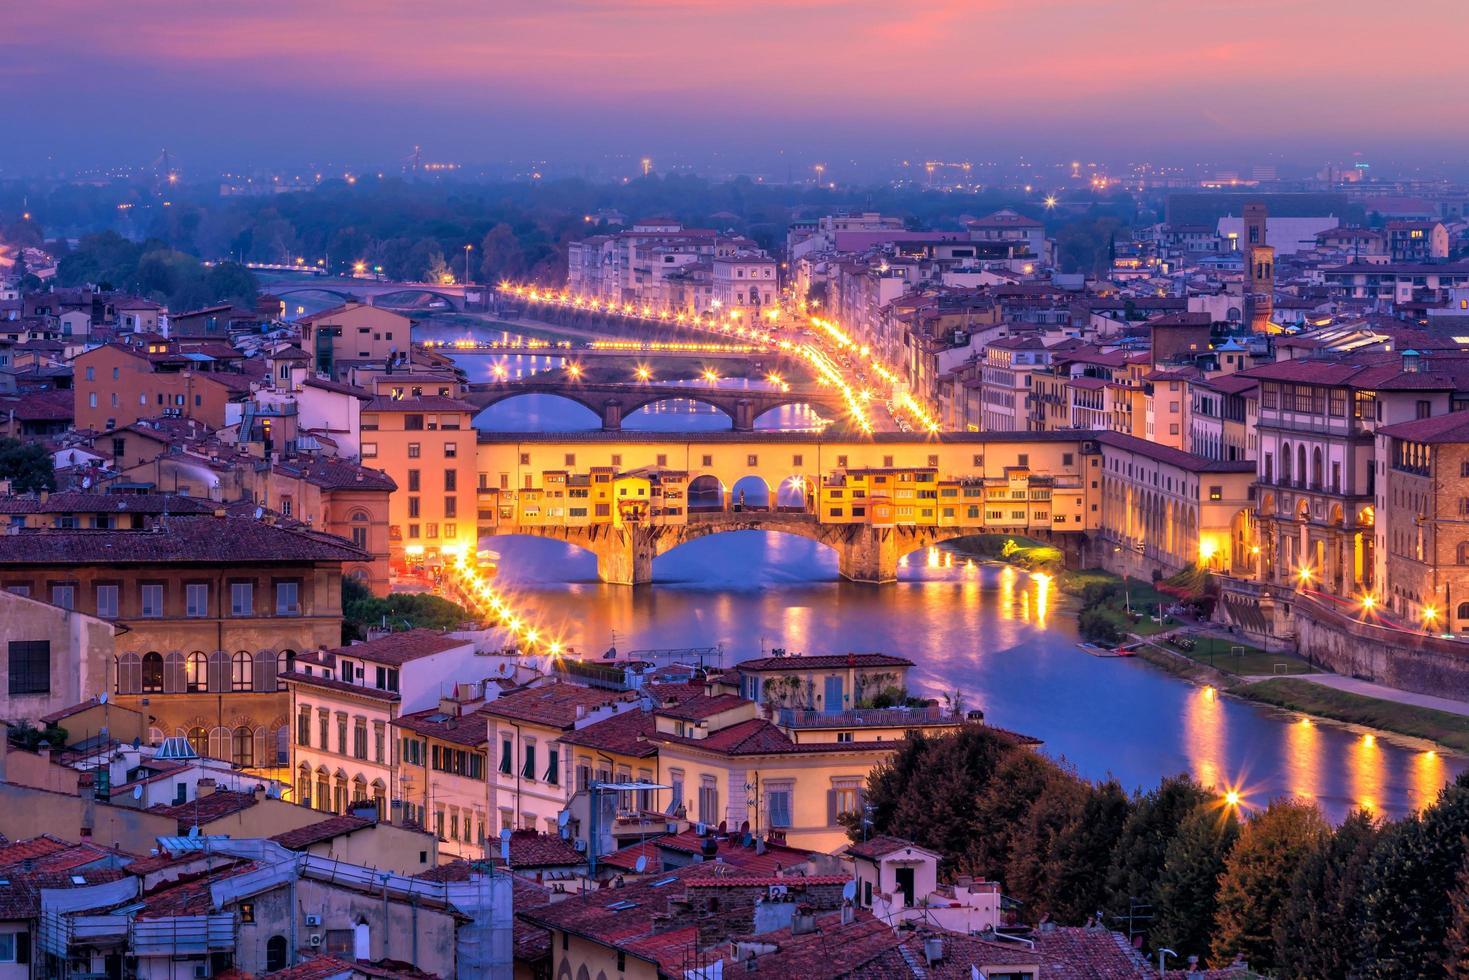 ponte vecchio over de rivier de arno in florence, italië. foto